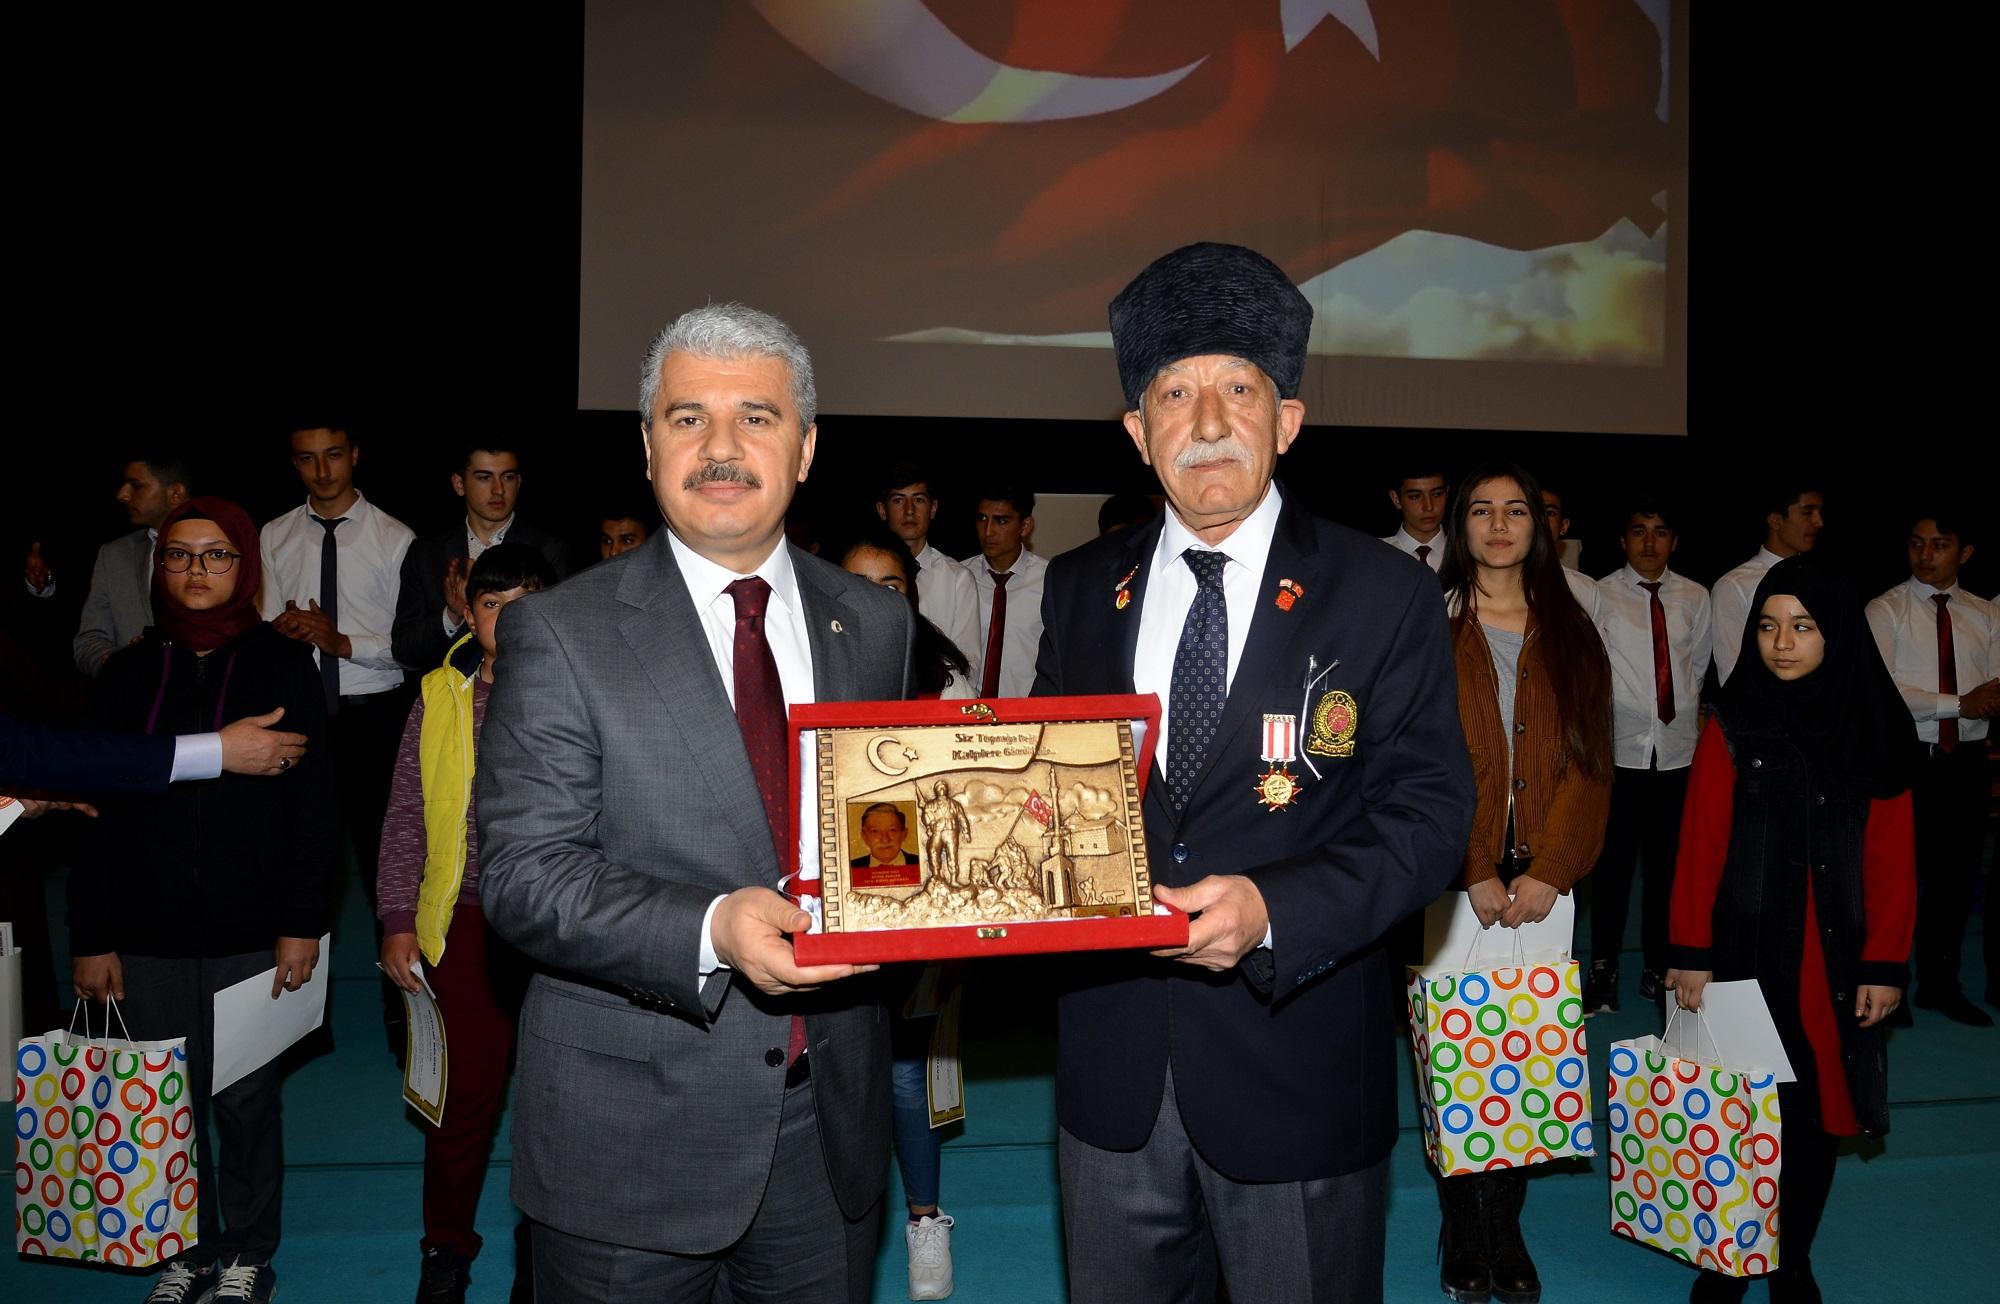 """MİLLETİN SESİ MEHMET AKİF ERSOY""PROGRAMI DÜZENLENDİ"